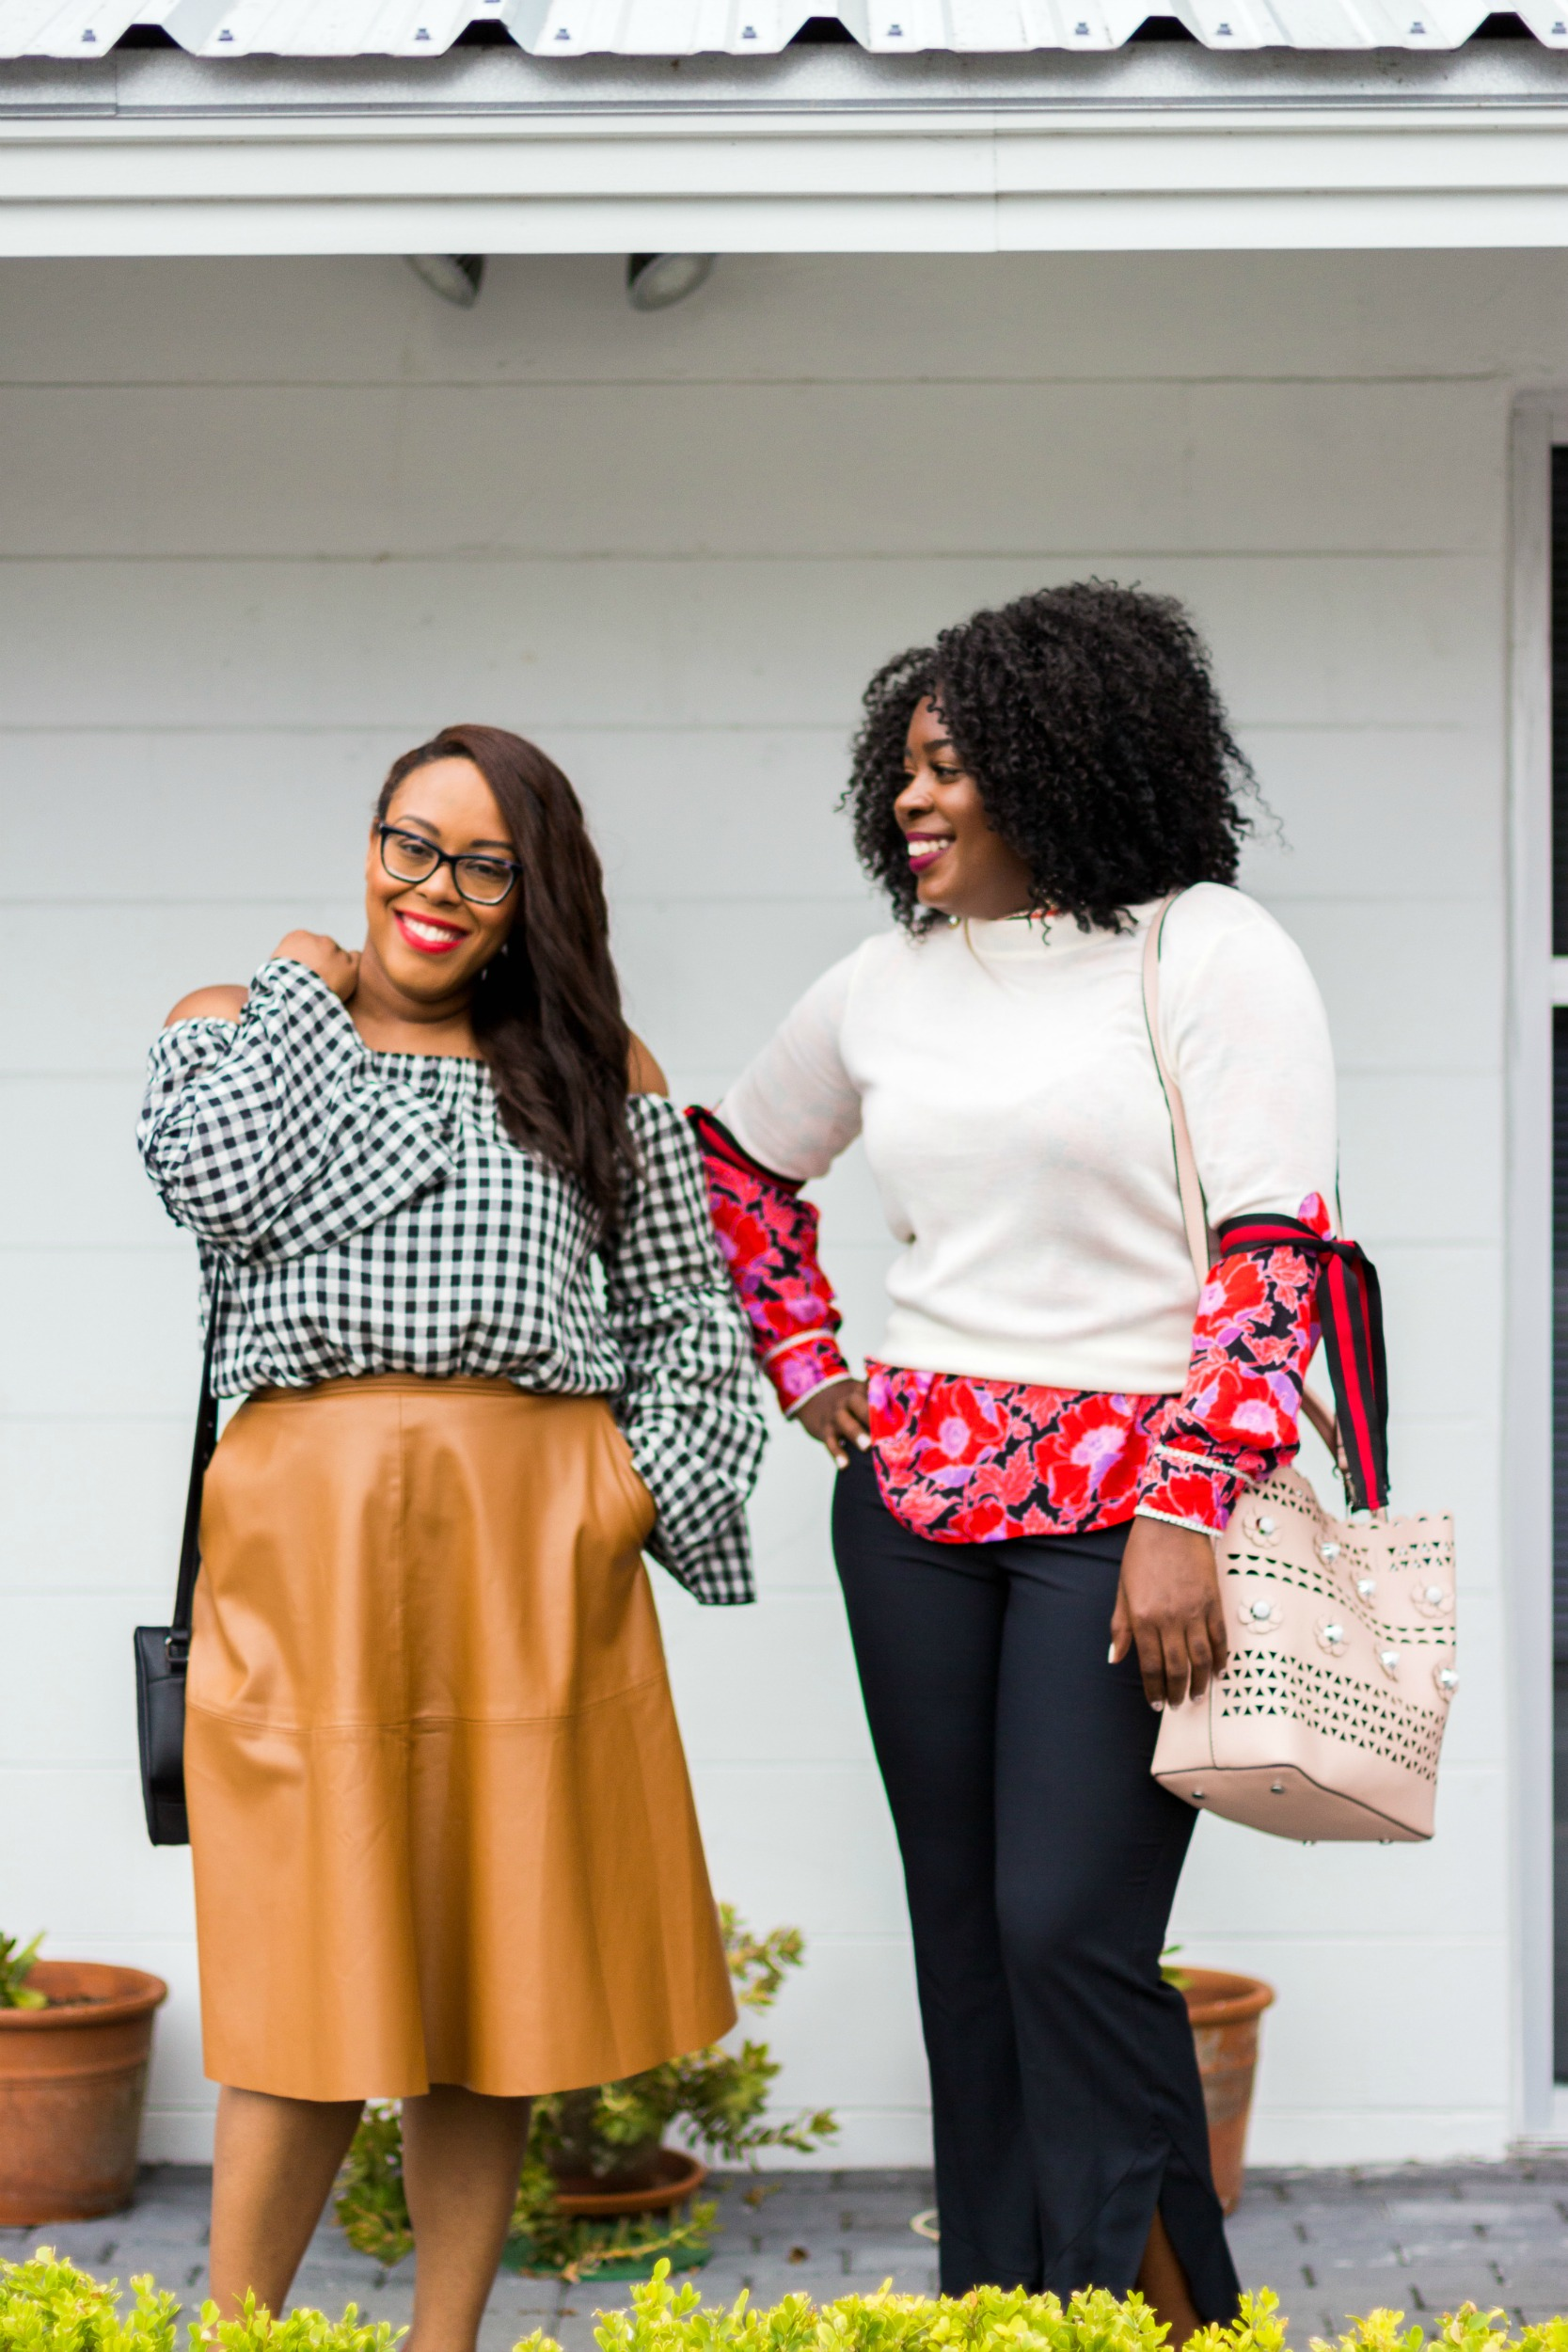 Better Blogs & Branding: 9 Tips for Finding The Right Tribe